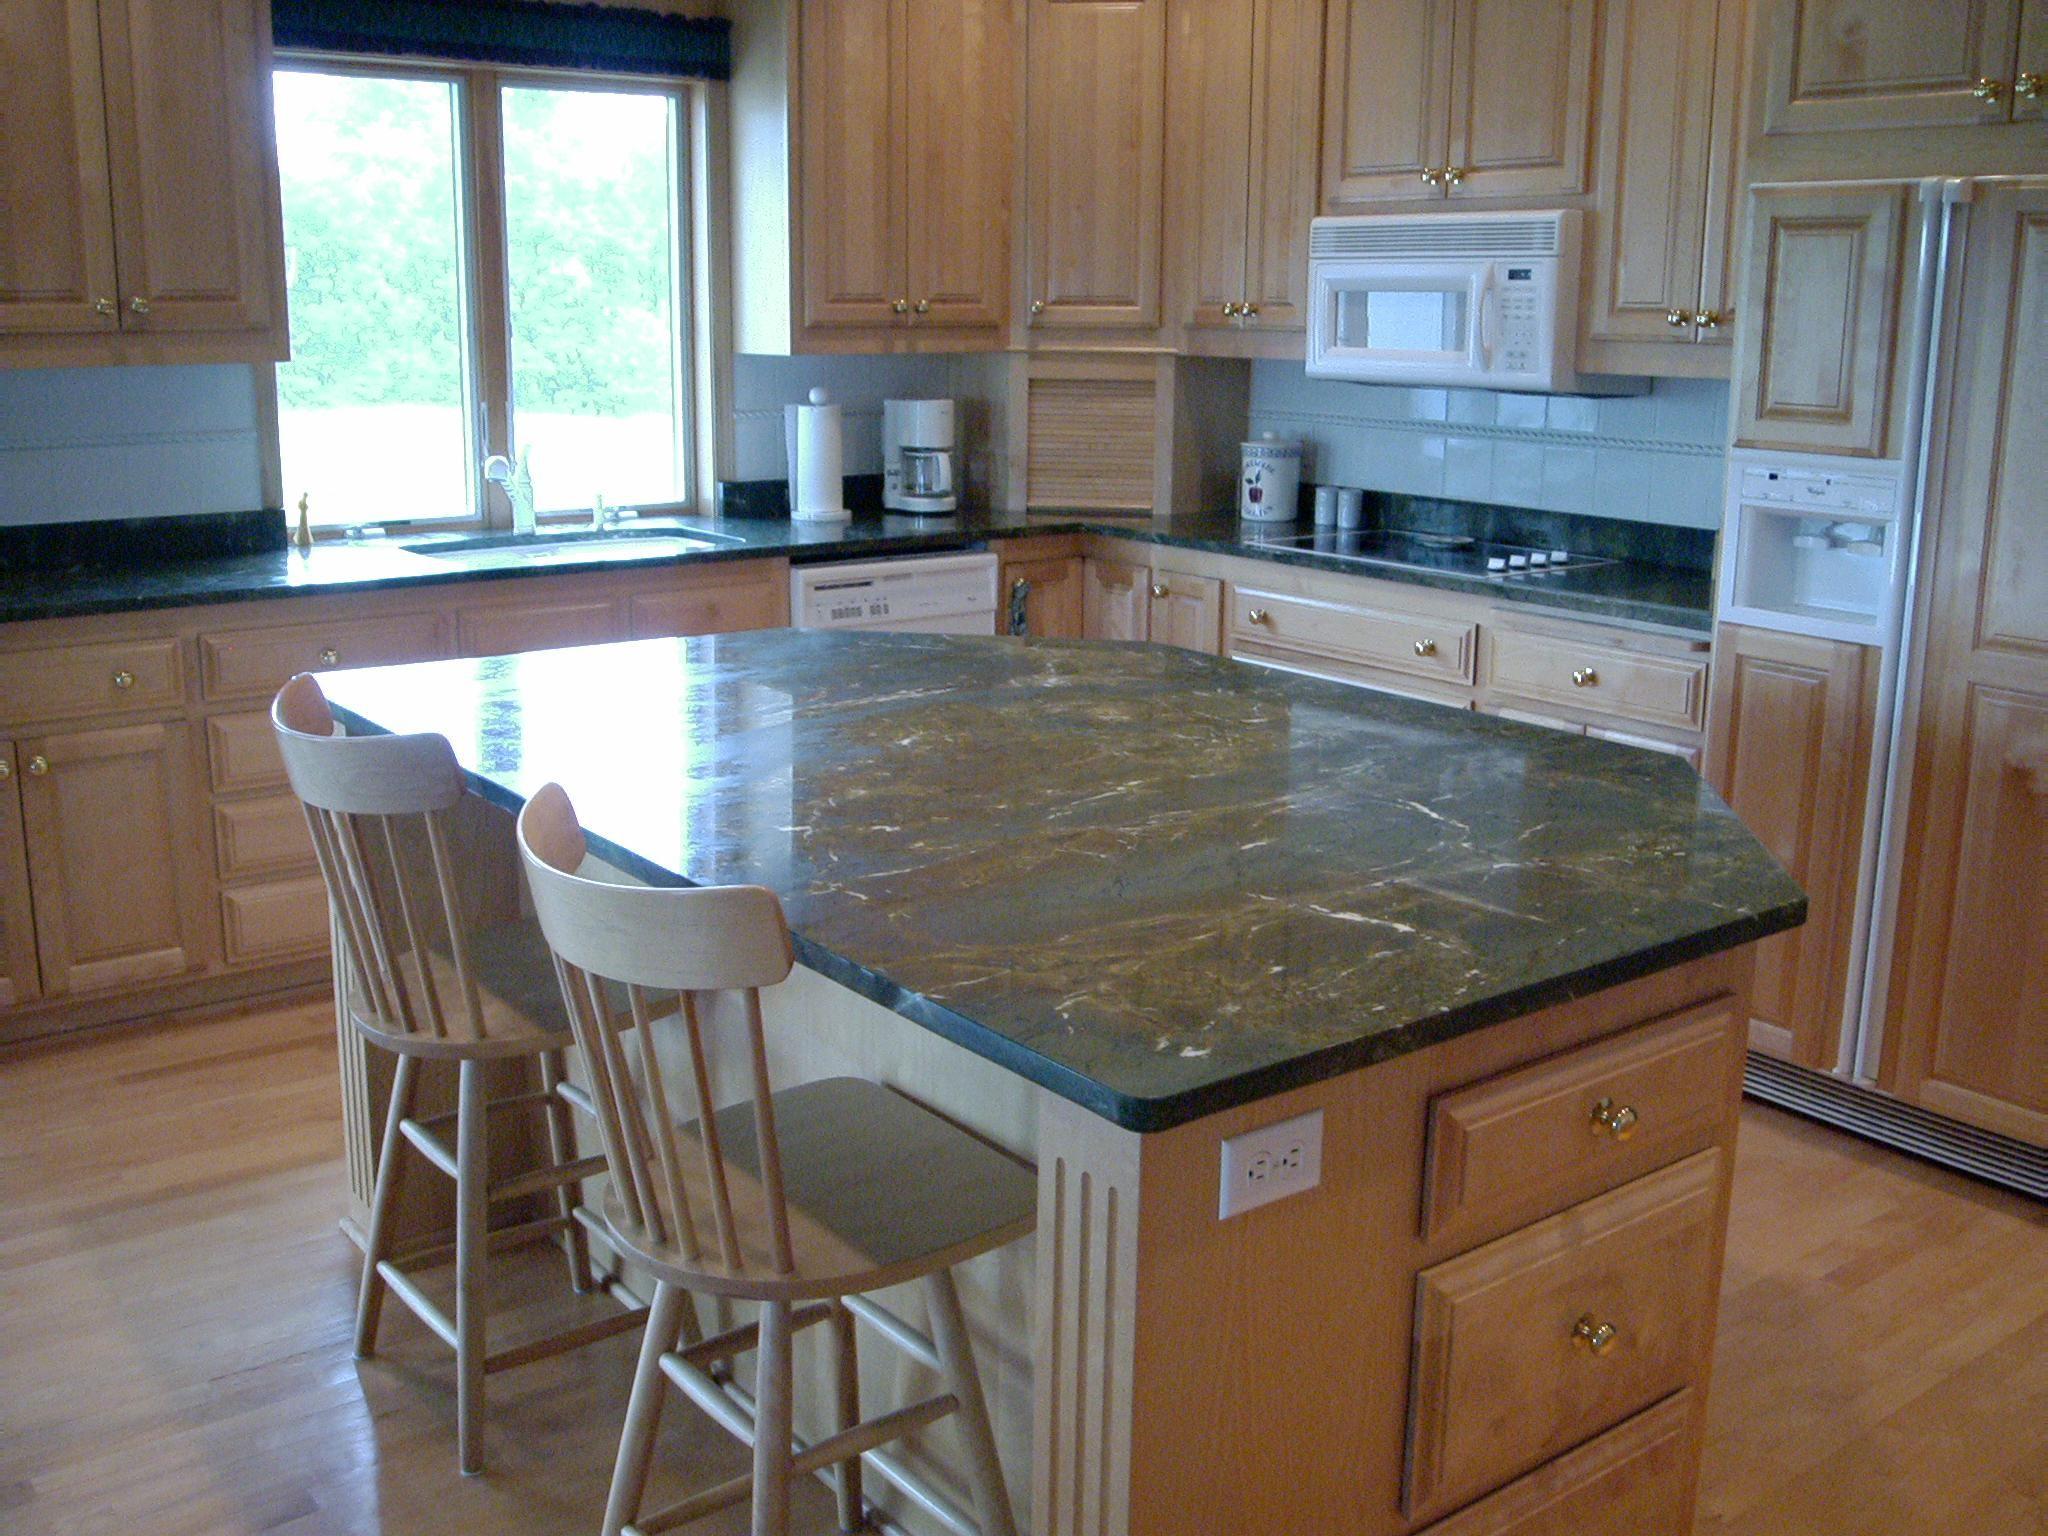 Kitchen Design Granite Simple Golden Musk Granite  Kitchen Design Gallery  Pinterest  Kitchen Design Decoration